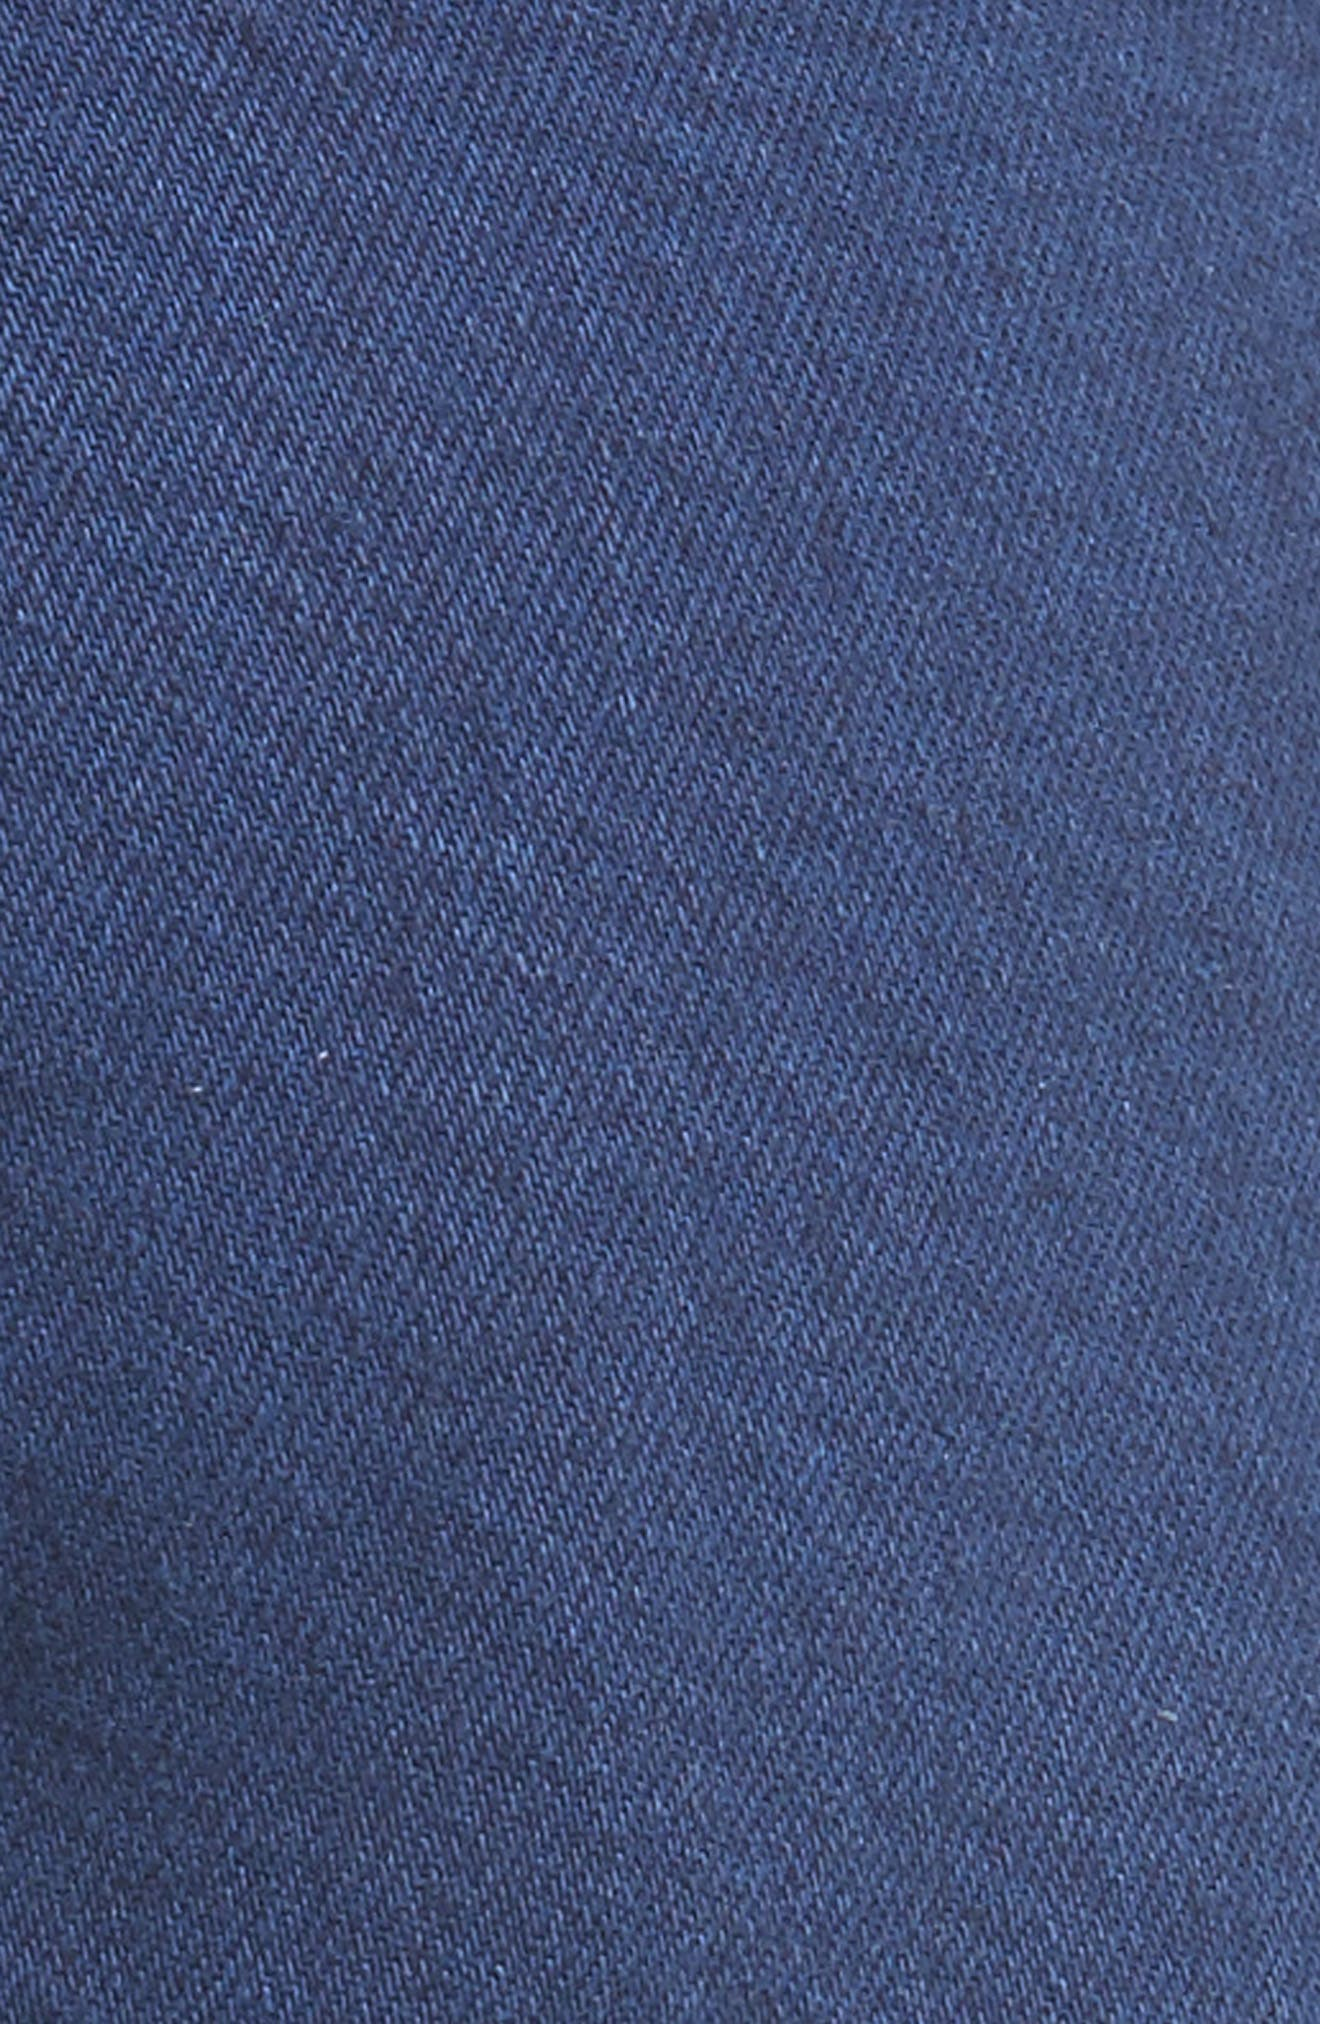 Alternate Image 5  - ACNE Studios River Slim Tapered Fit Jeans (Cobalt)